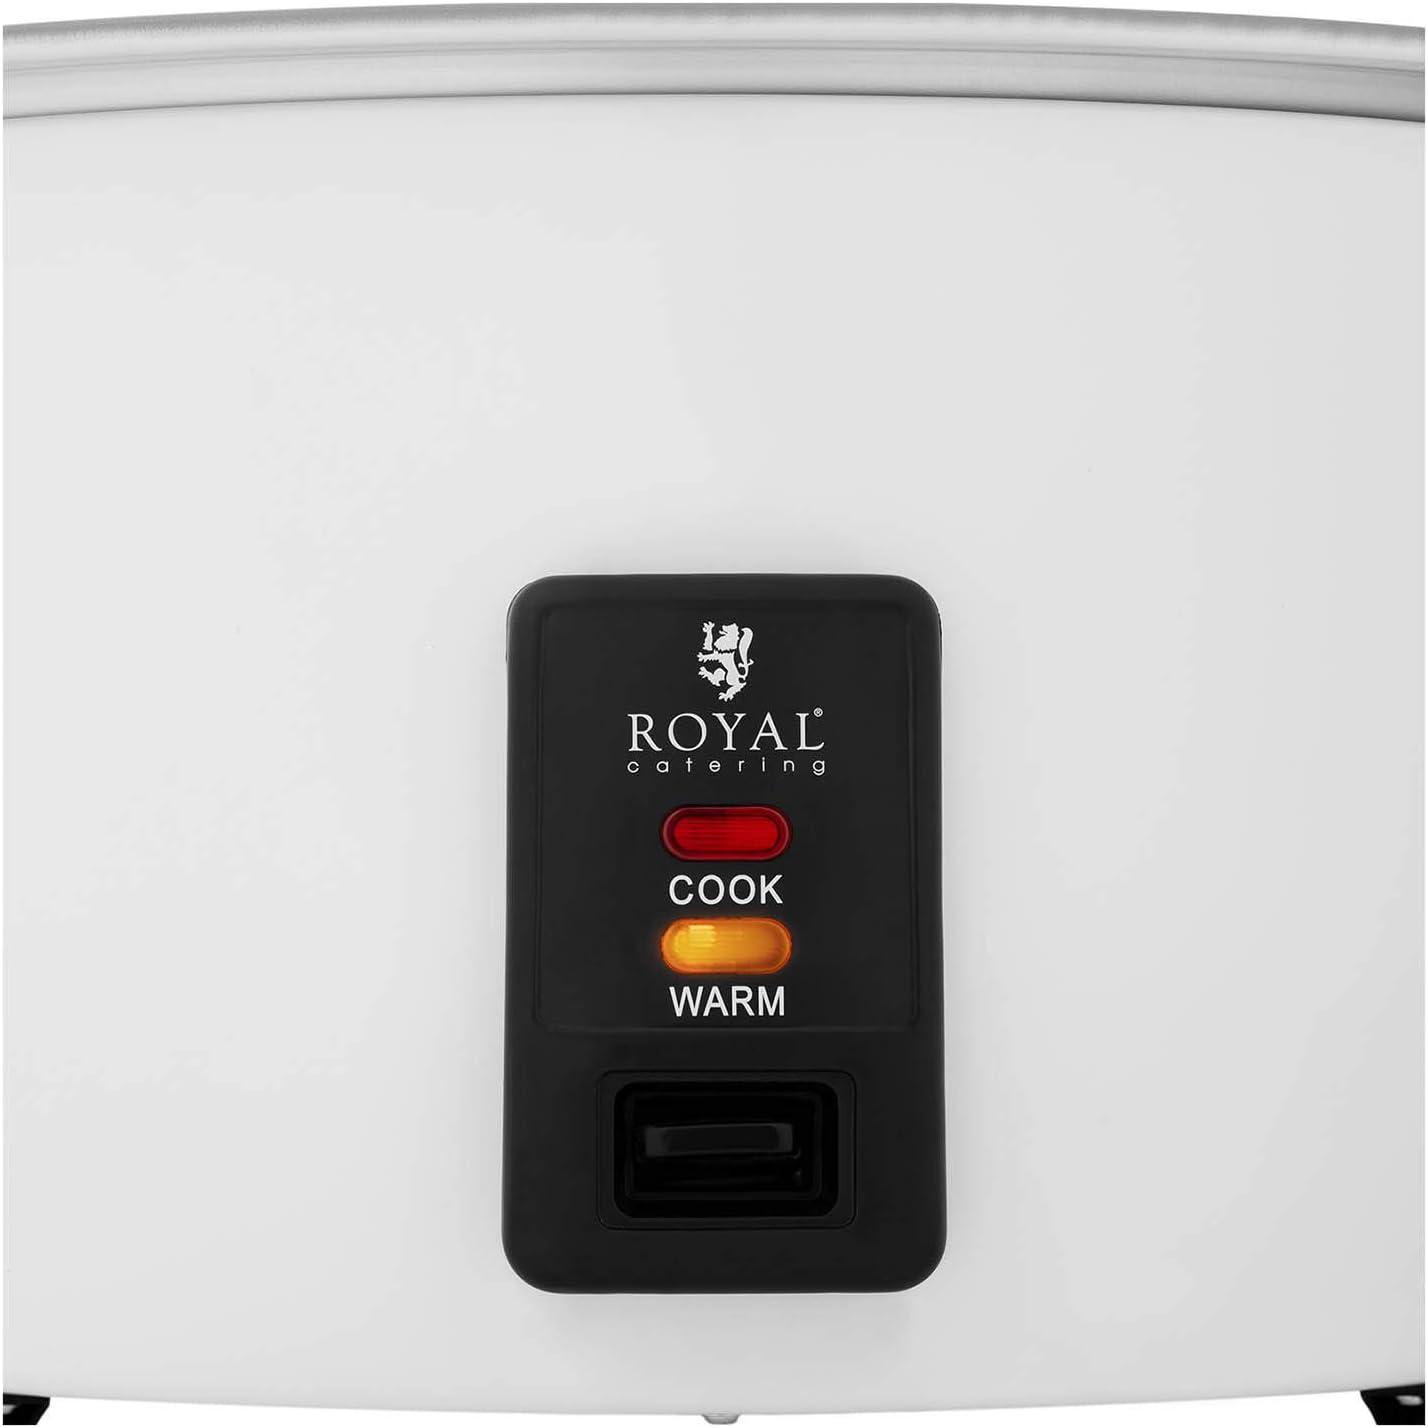 Olla de cocci/ón de aluminio, Carcasa de acero inoxidable, 19 L, Potencia: 2650 W Royal Catering Arrocera Olla Para Arroz RCRK-19L